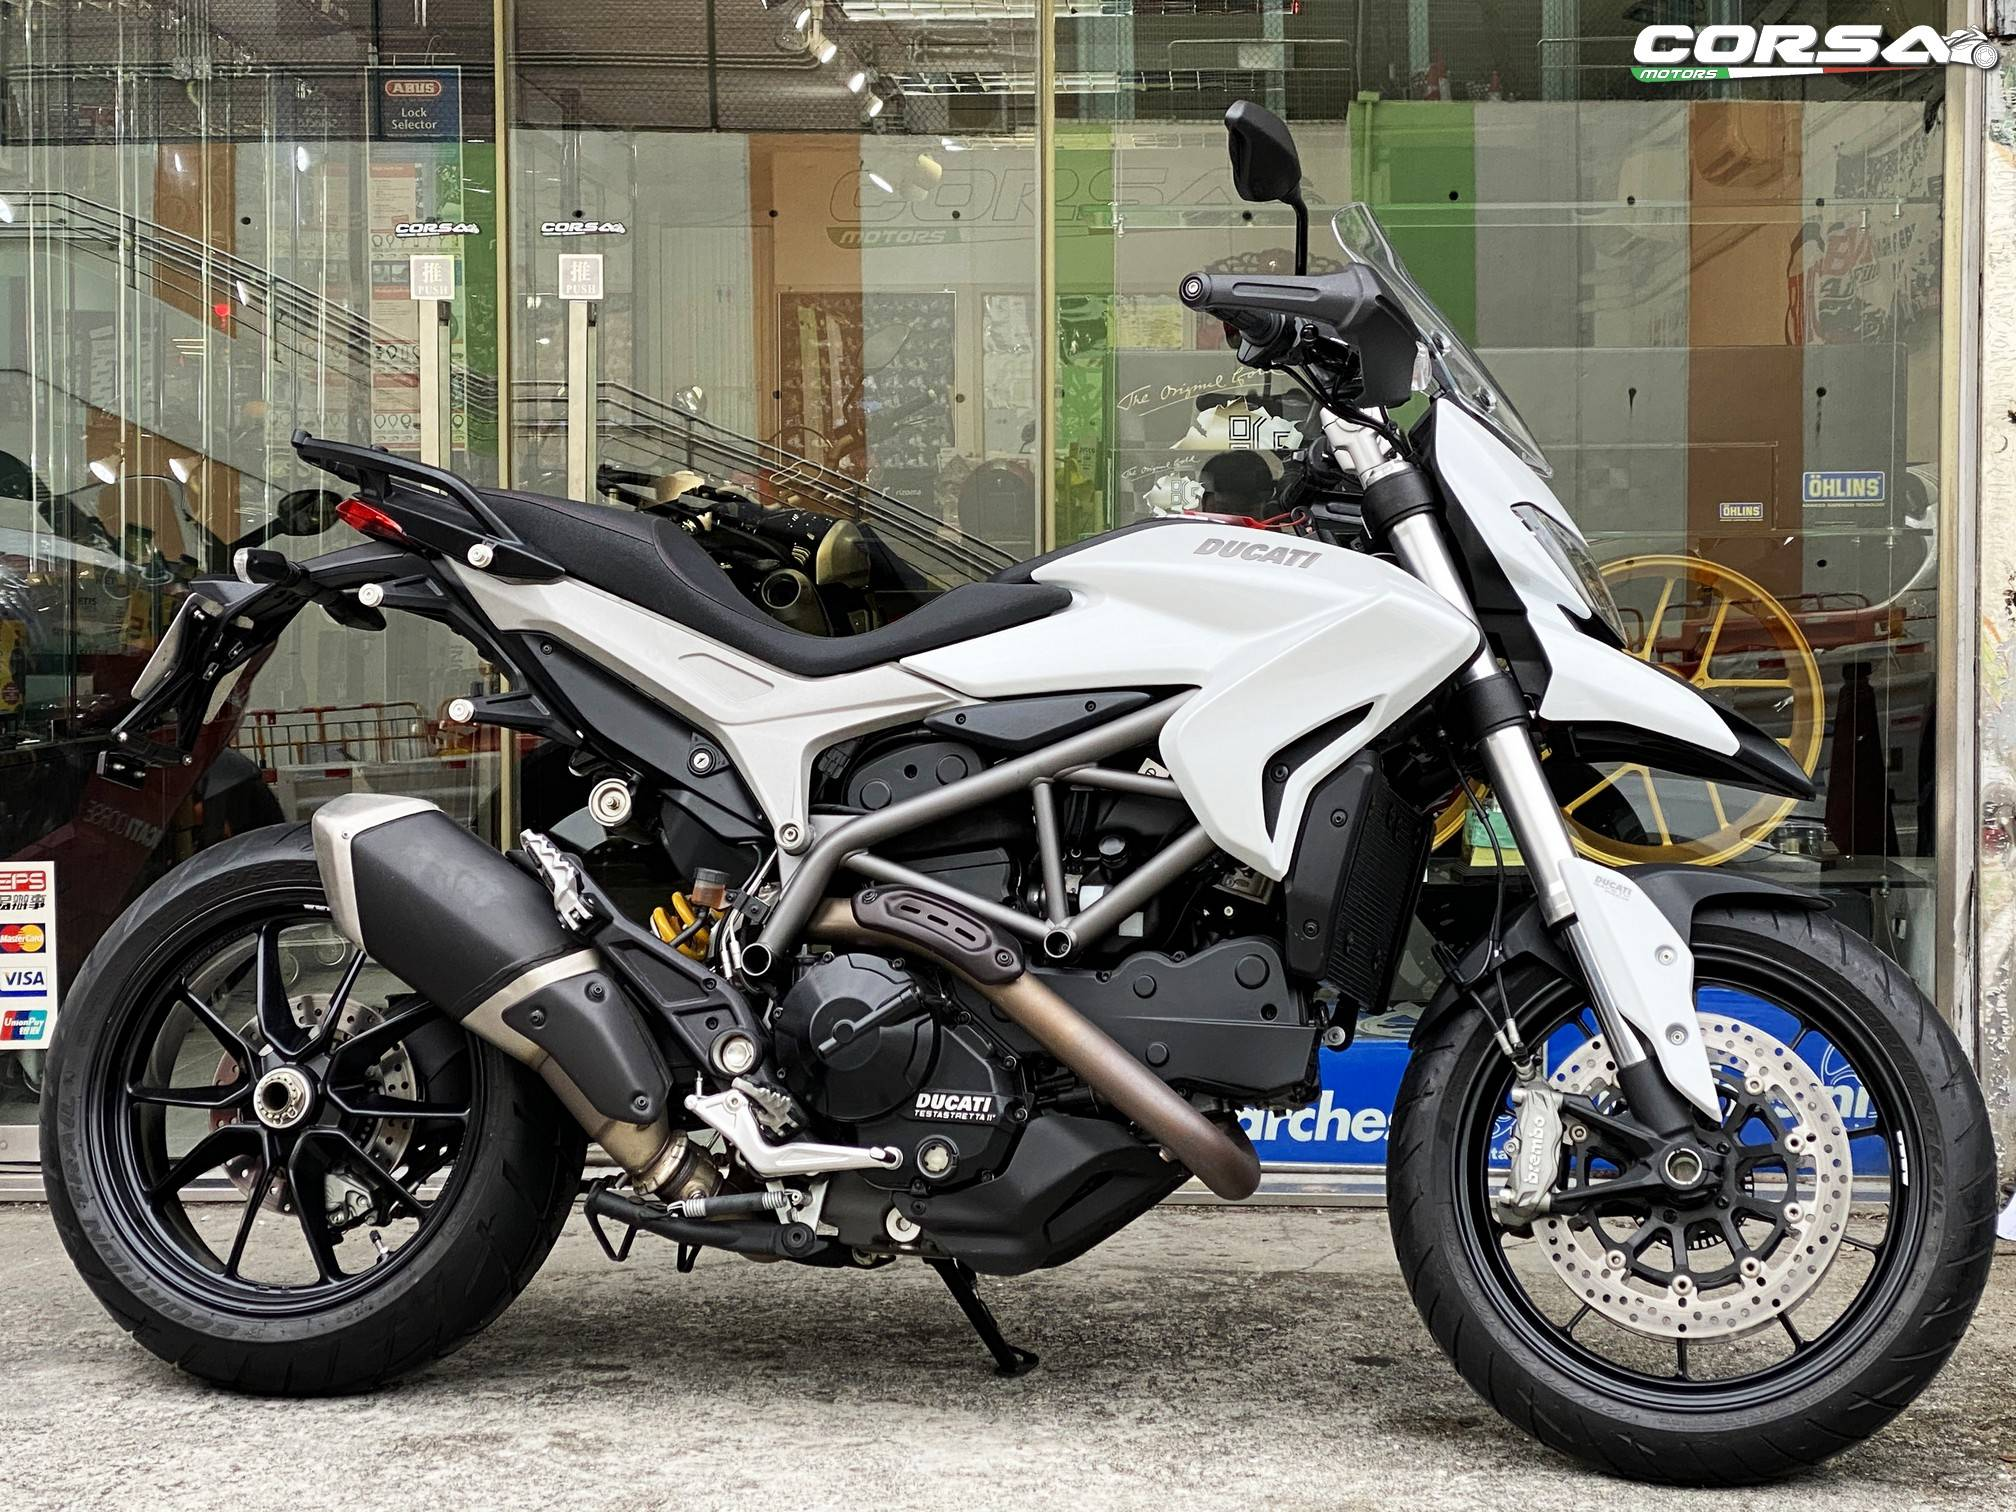 DUCATI HYPERSTRADA 2014    -「Webike摩托車市」